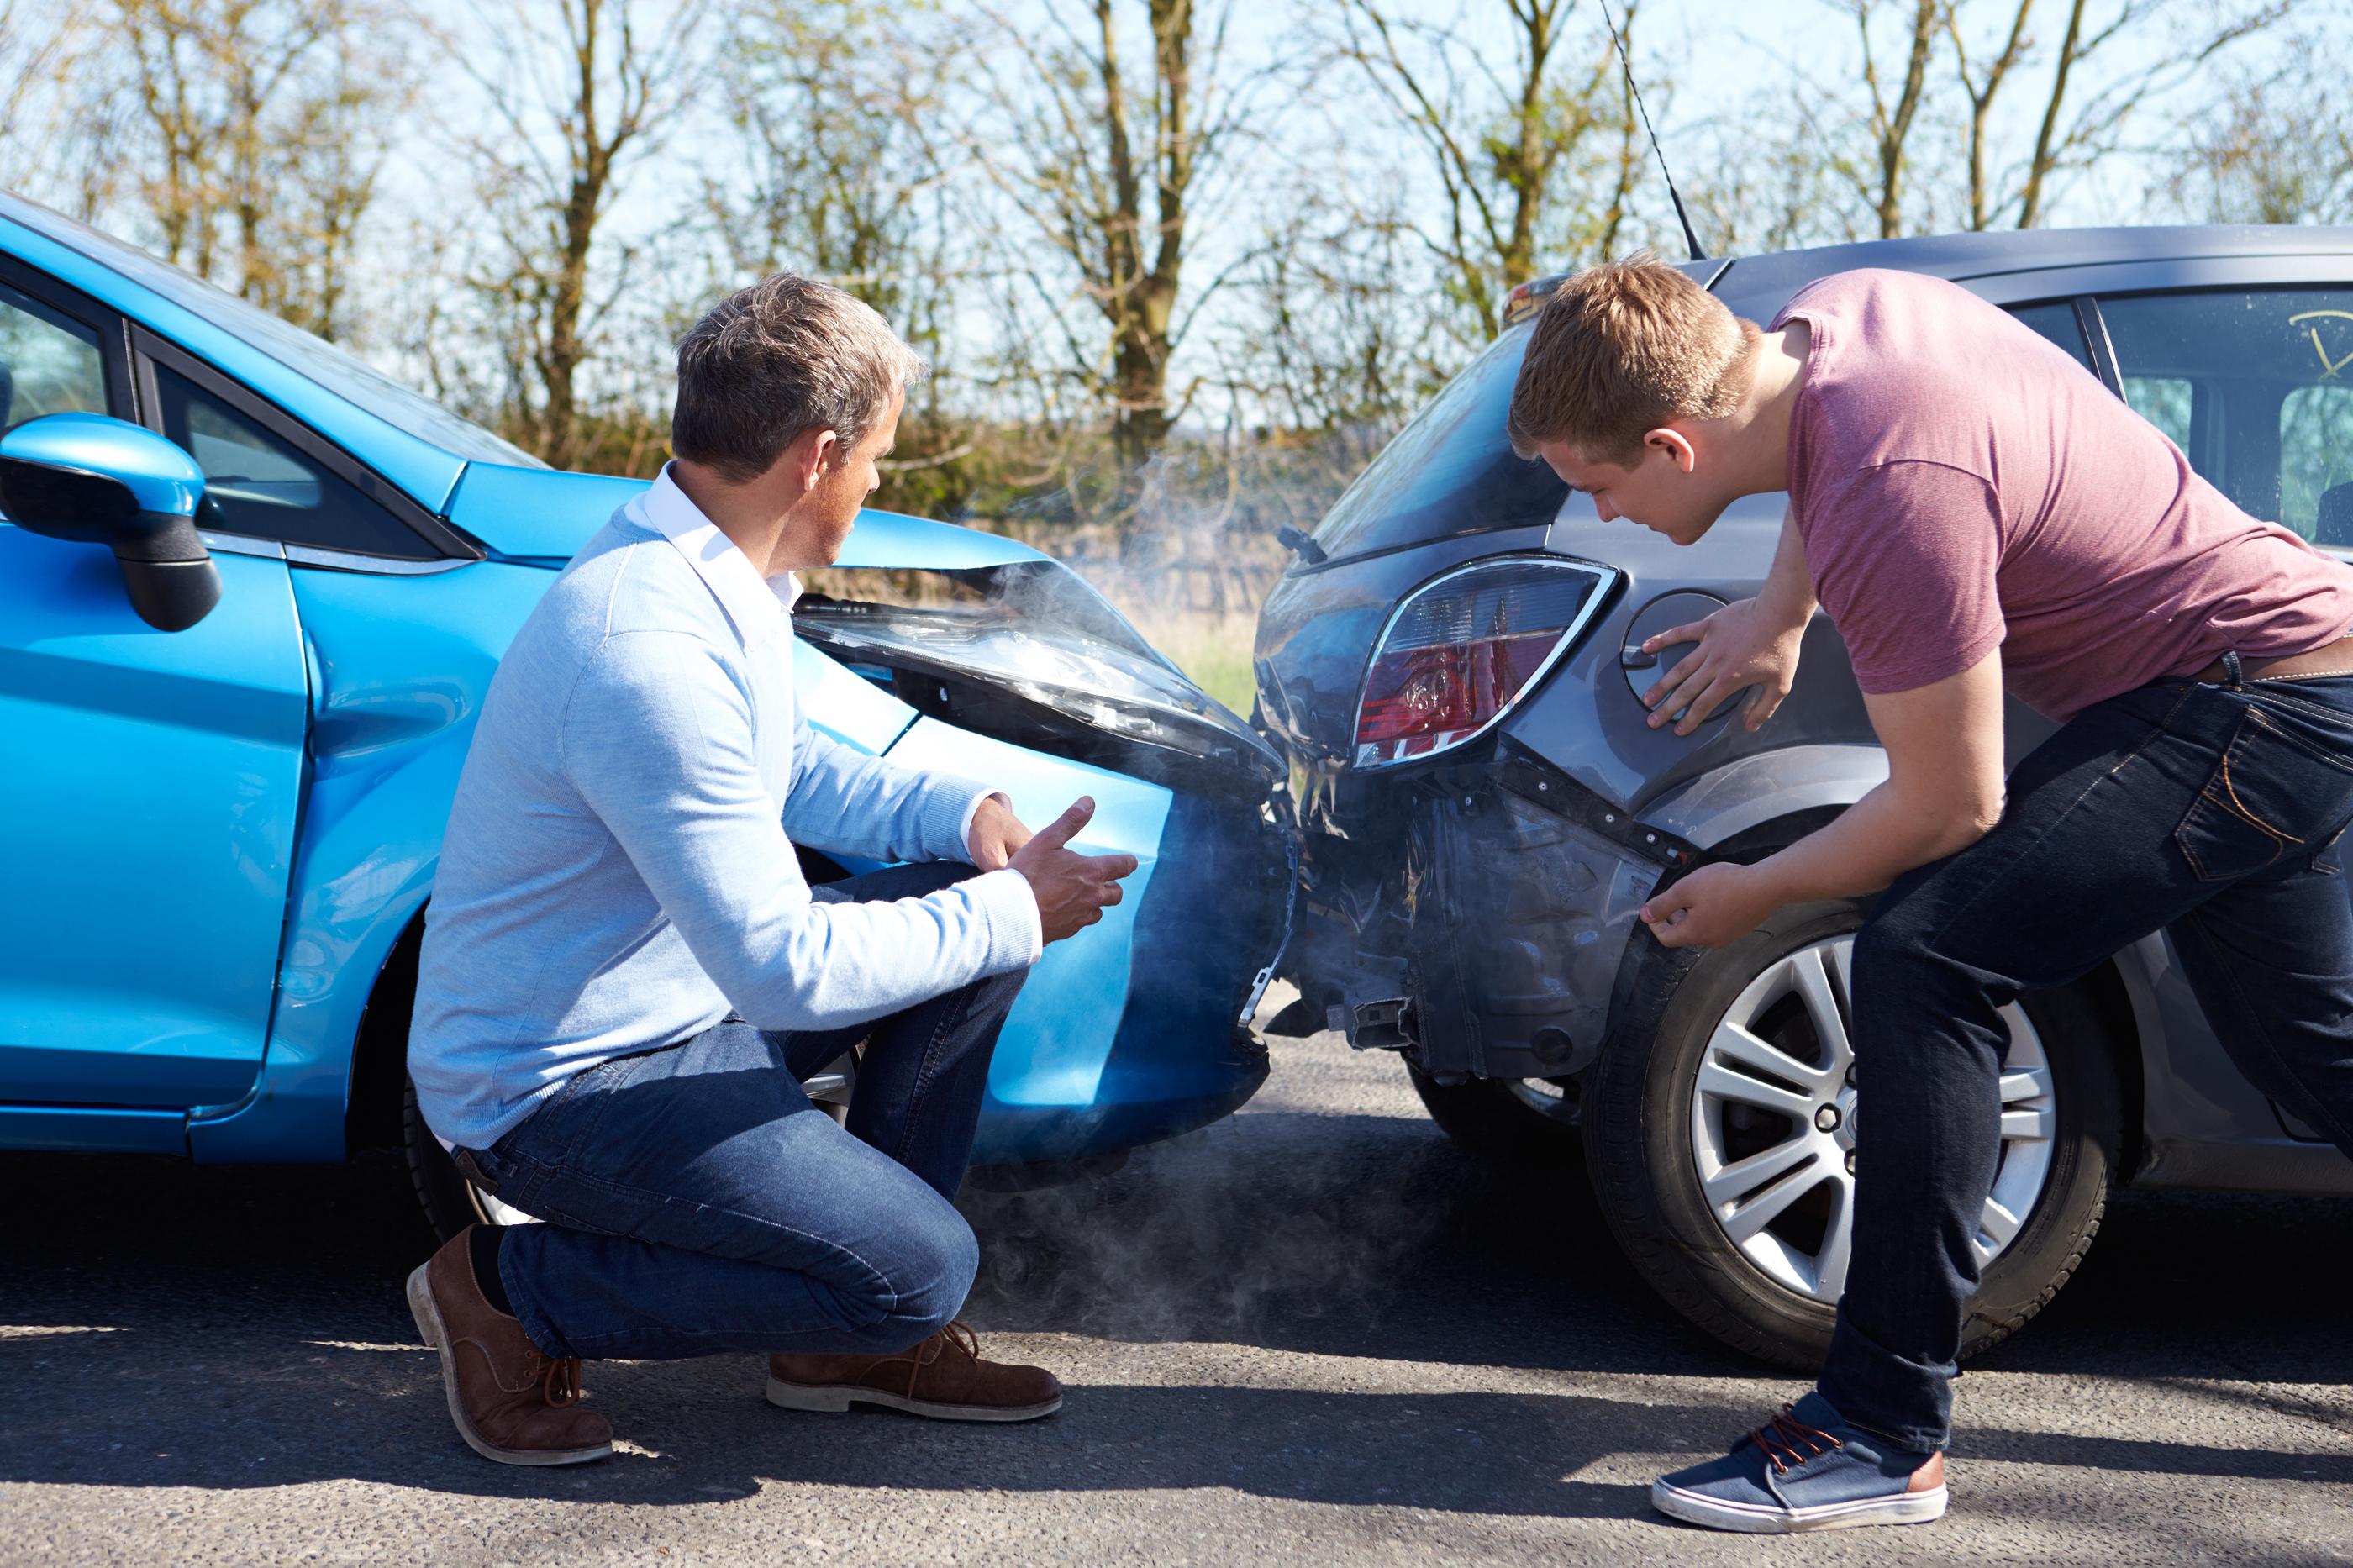 Auto Insurance Covers Chiro Care